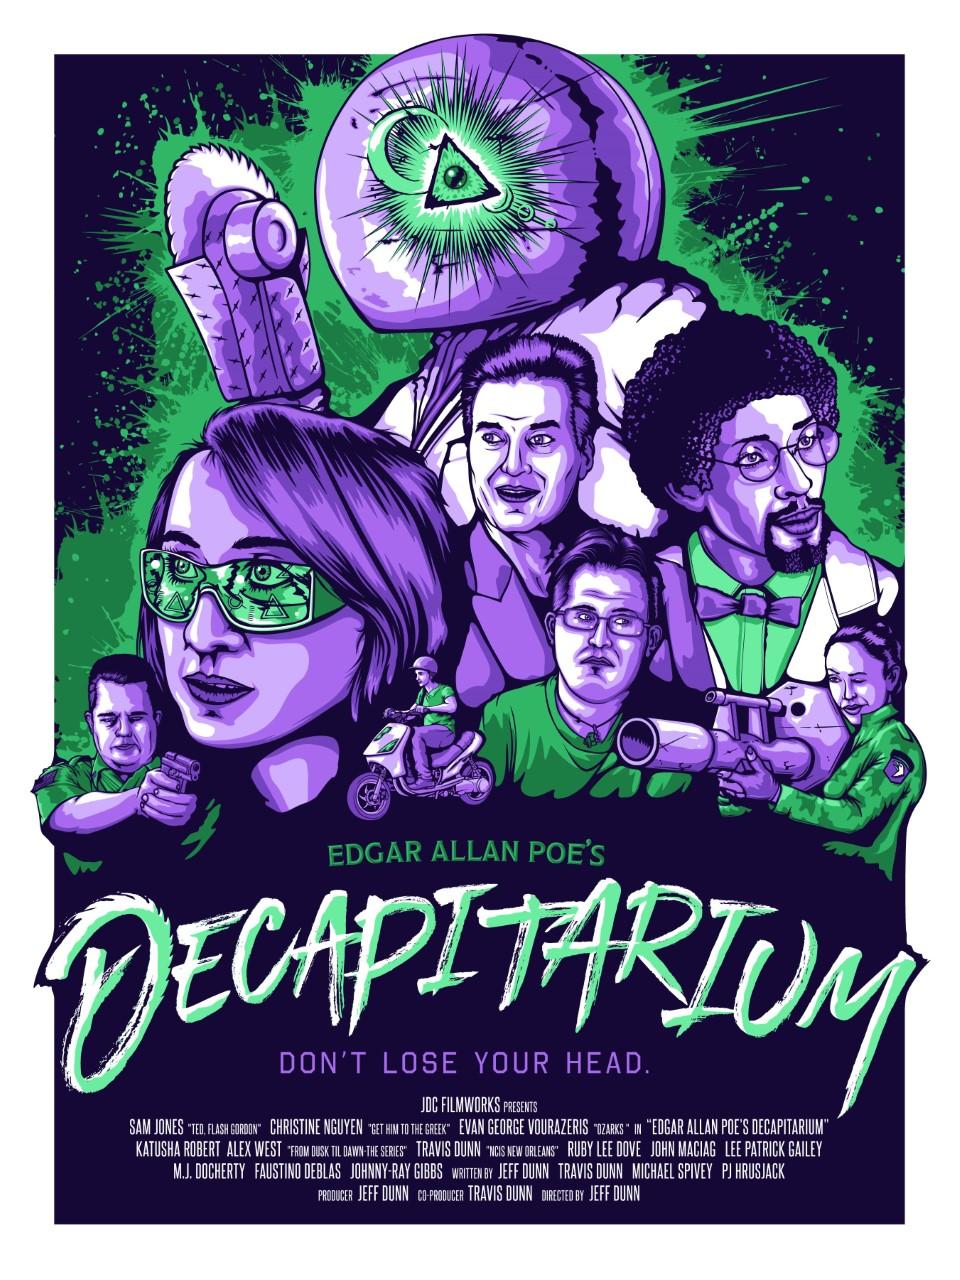 Decapitarium hd on soap2day